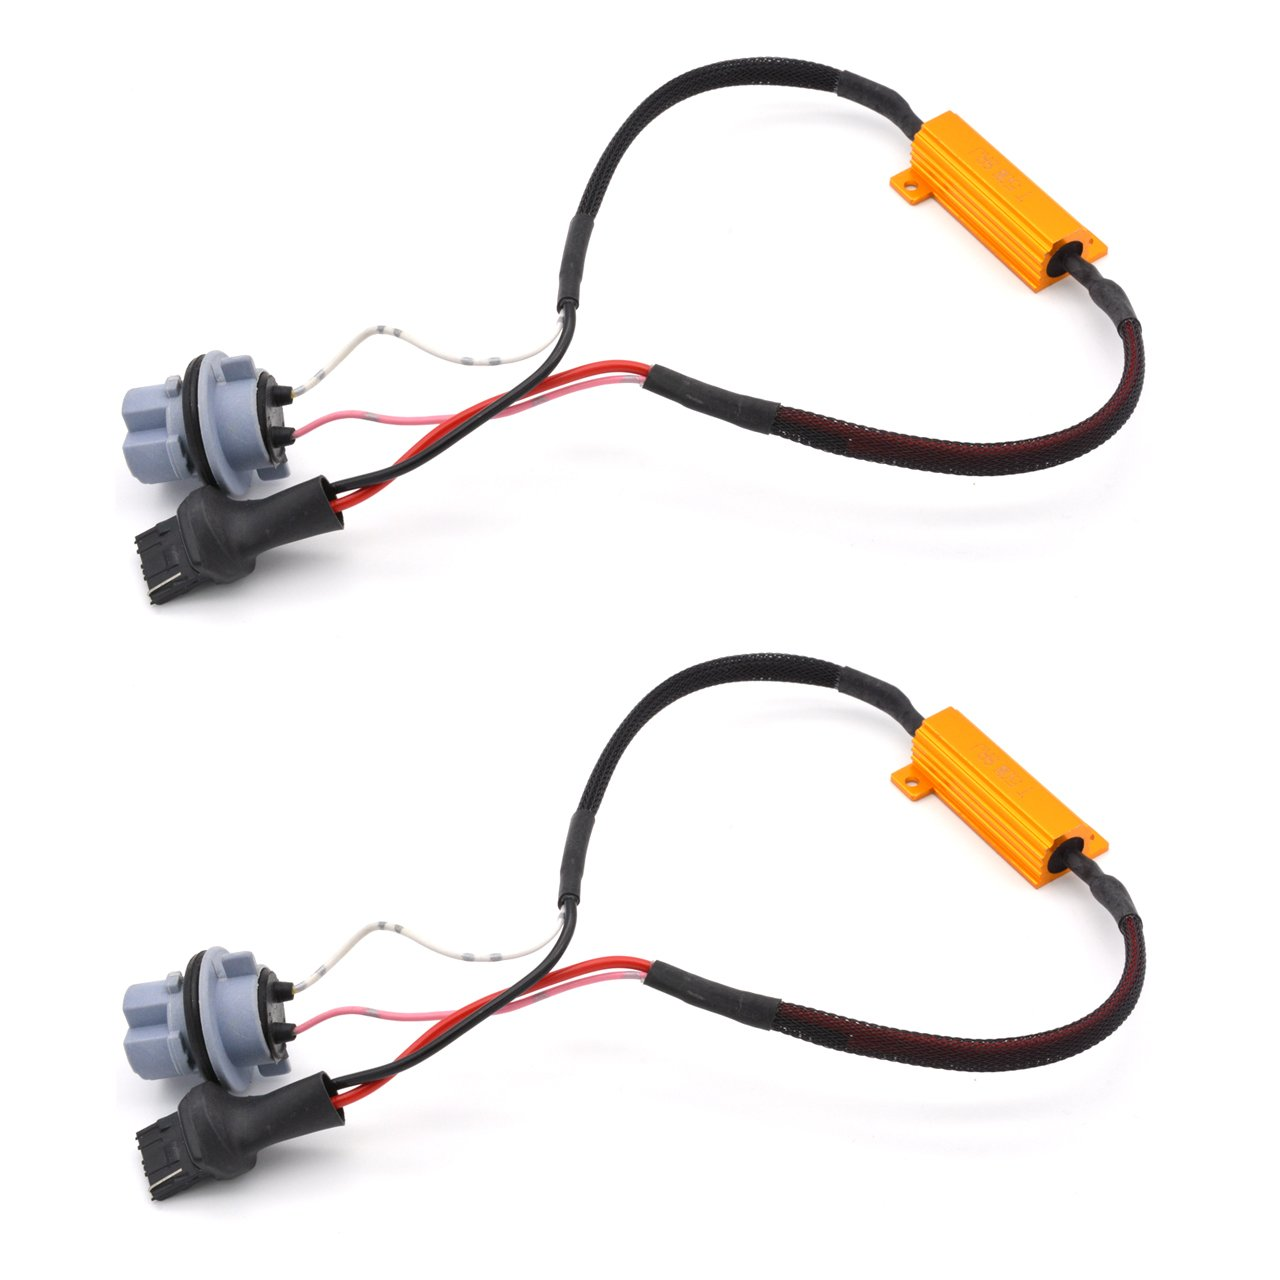 KaTur 2pcs 50W 8ohm 3156 3156A 3456 Led Load Resistors - Fix LED Bulb Fast Hyper Flash for LED Turn Signal Light Blink or LED License Plate Lights Error